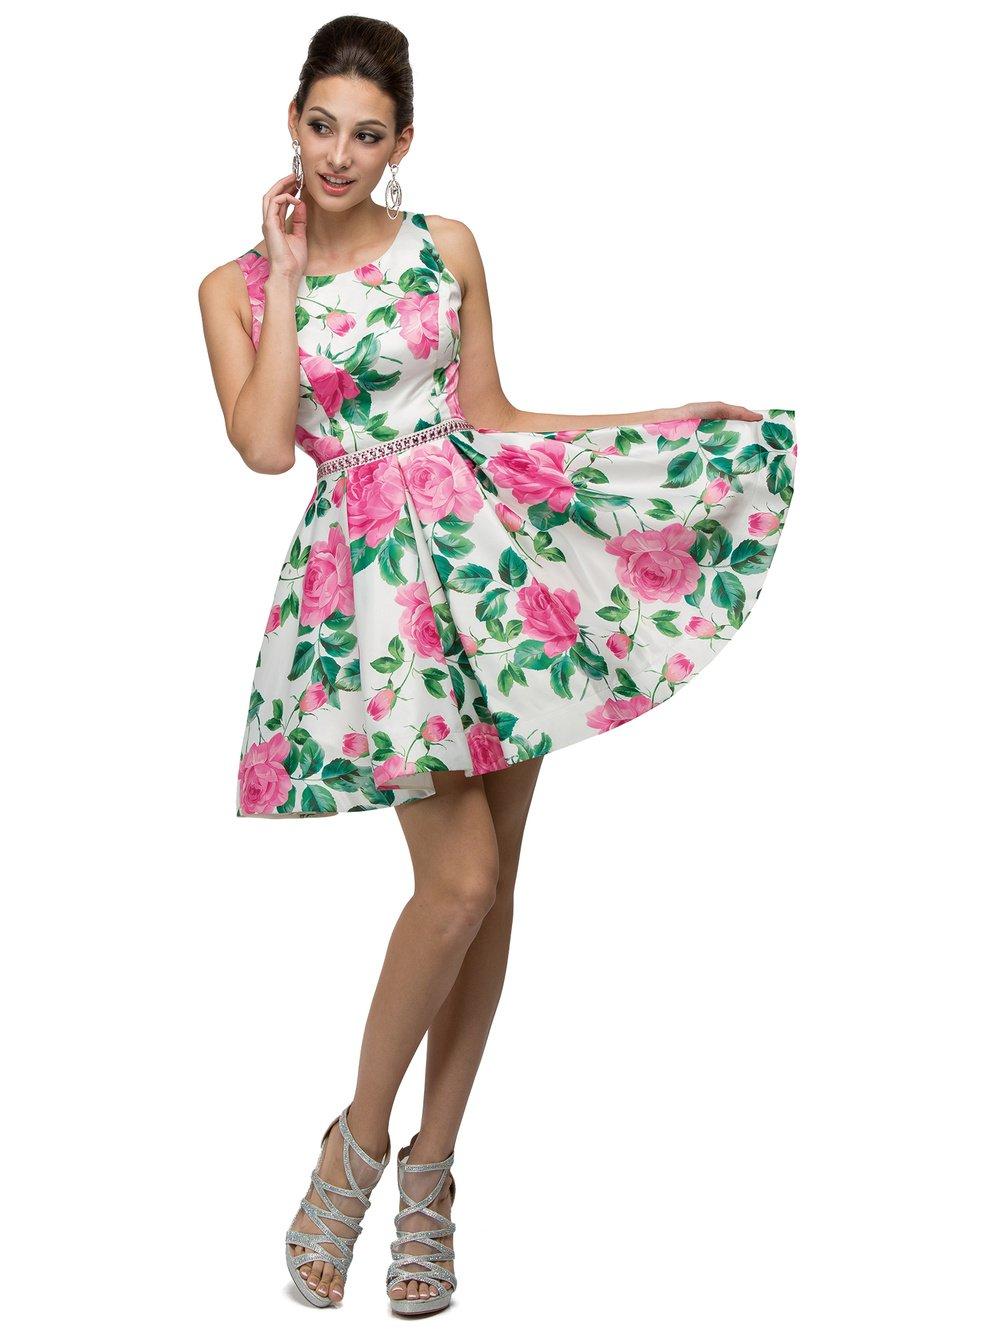 Floral Print Pinks